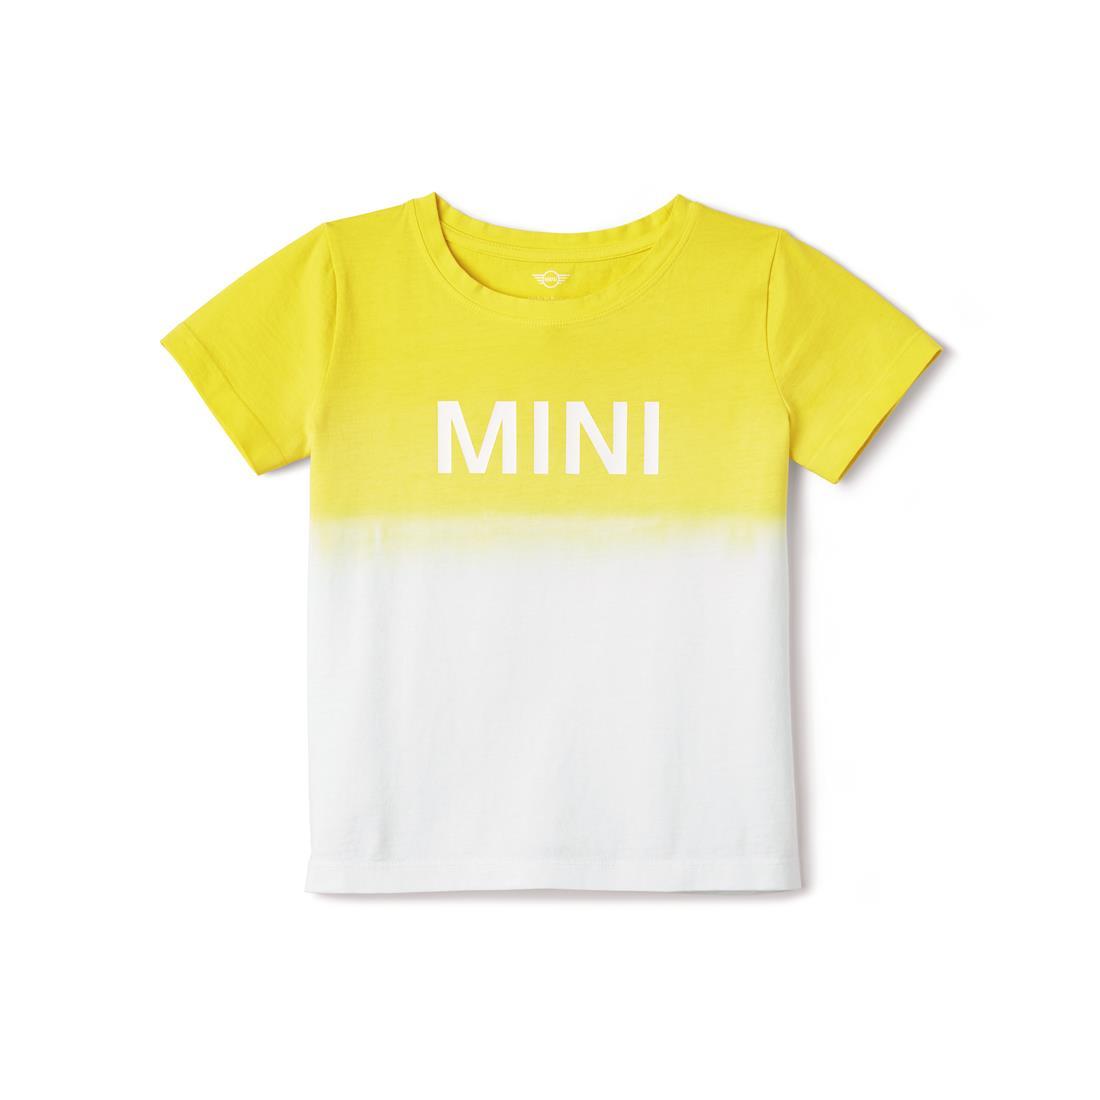 Shopminiusa Mini Kids Dip Dyed Contrast Wordmark Print T Shirt